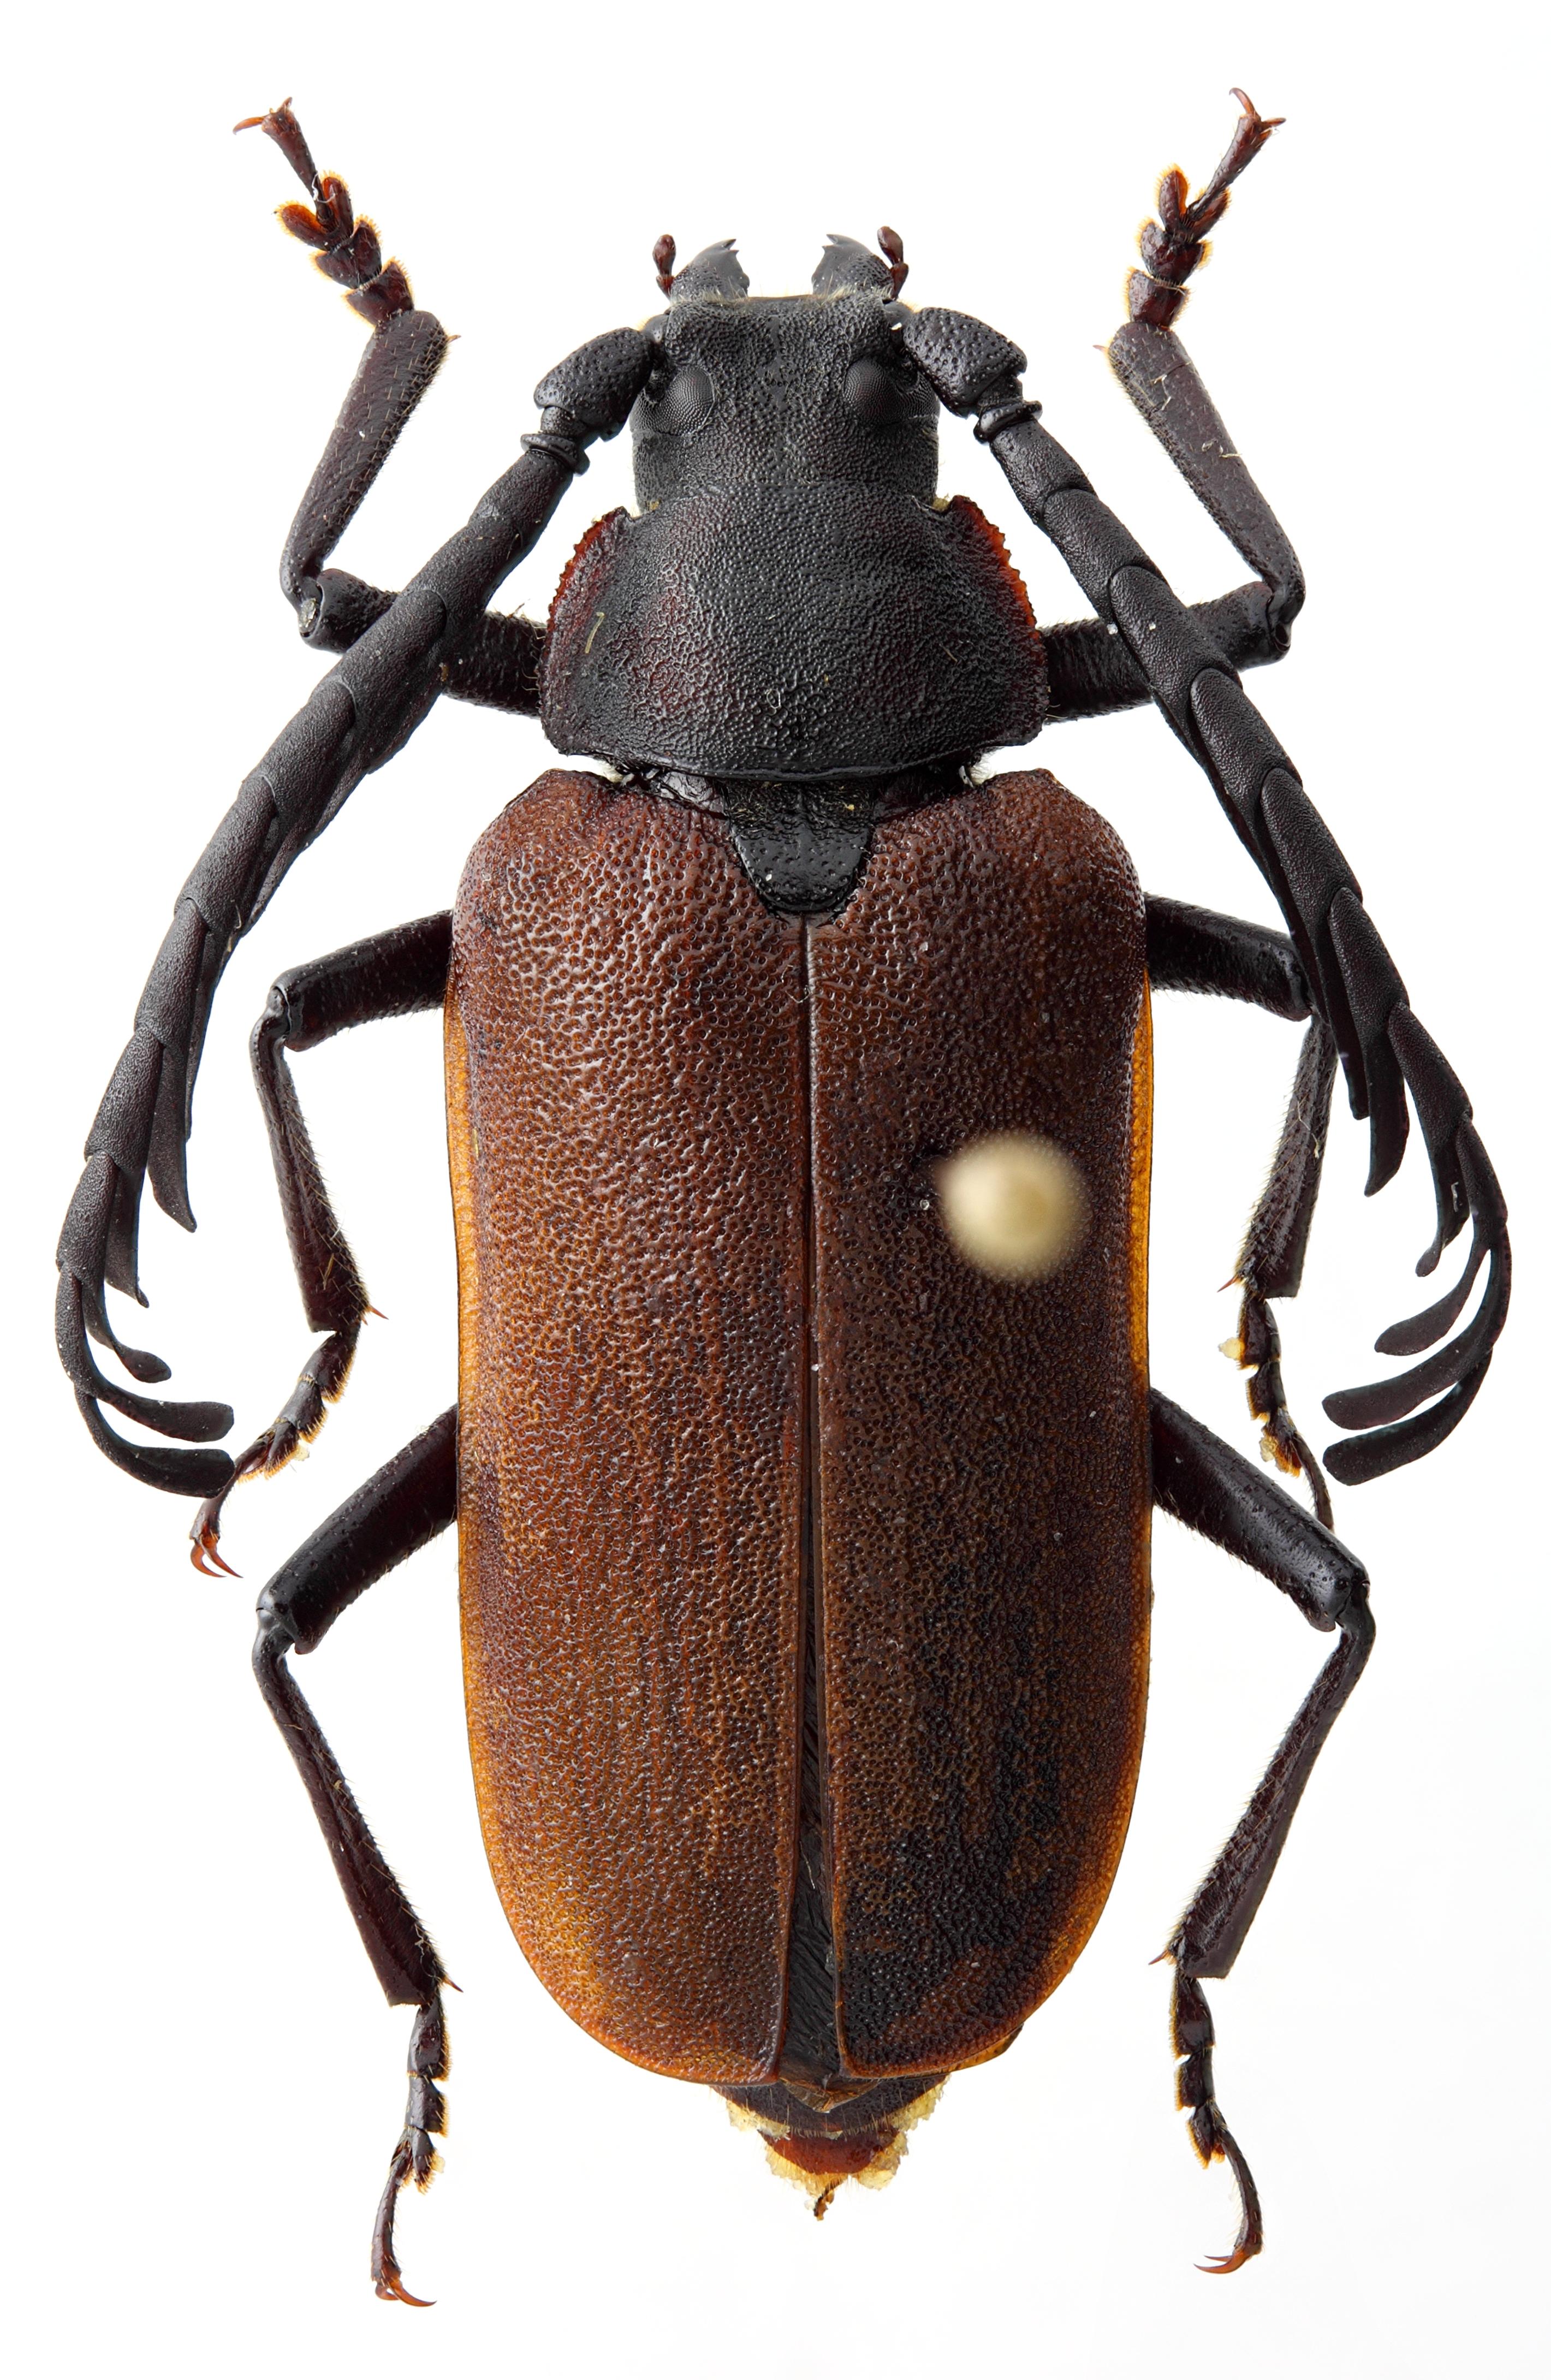 Casiphia yunnana 01 HP Holotype M 025 BRUS 201405.jpg